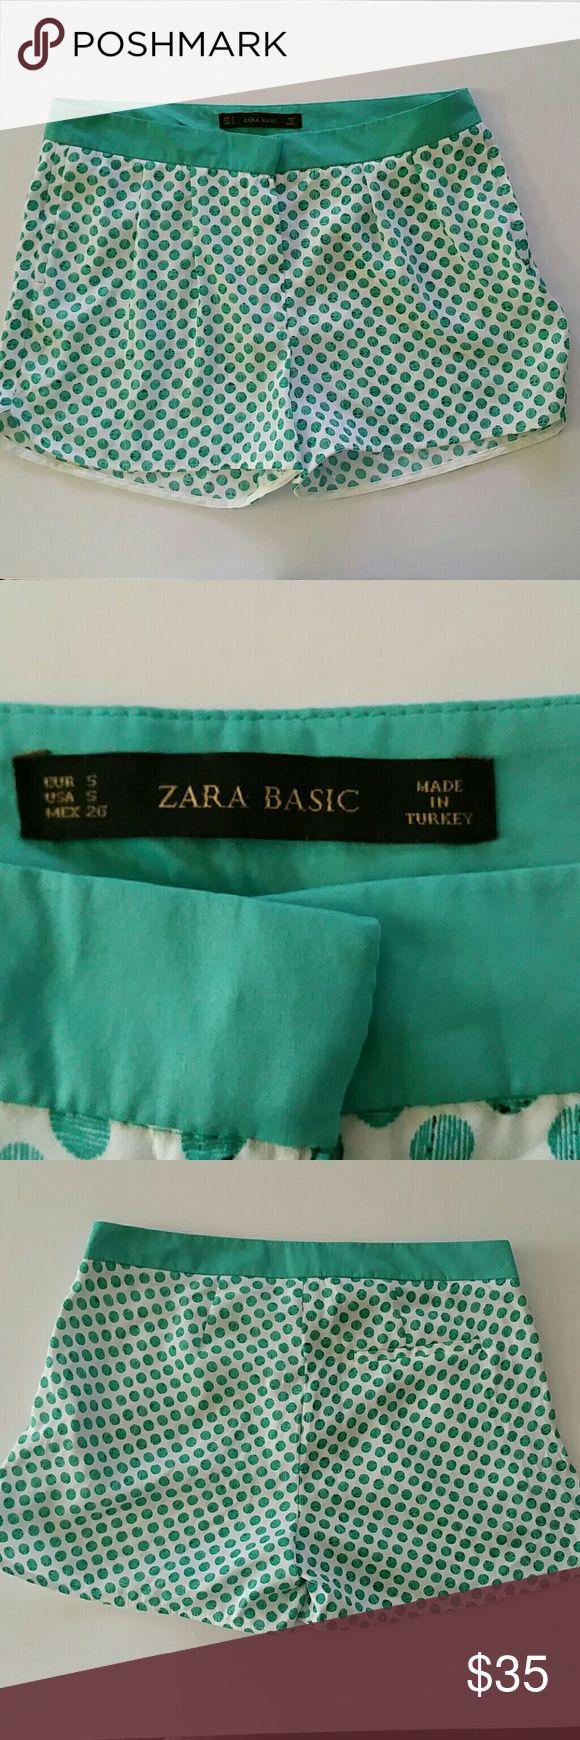 "Zara Basic Shorts Zara Basic women's shorts Waist 14.5"" Top to bottom 12"" Side pockets with a front zipper Zara Basic Shorts"